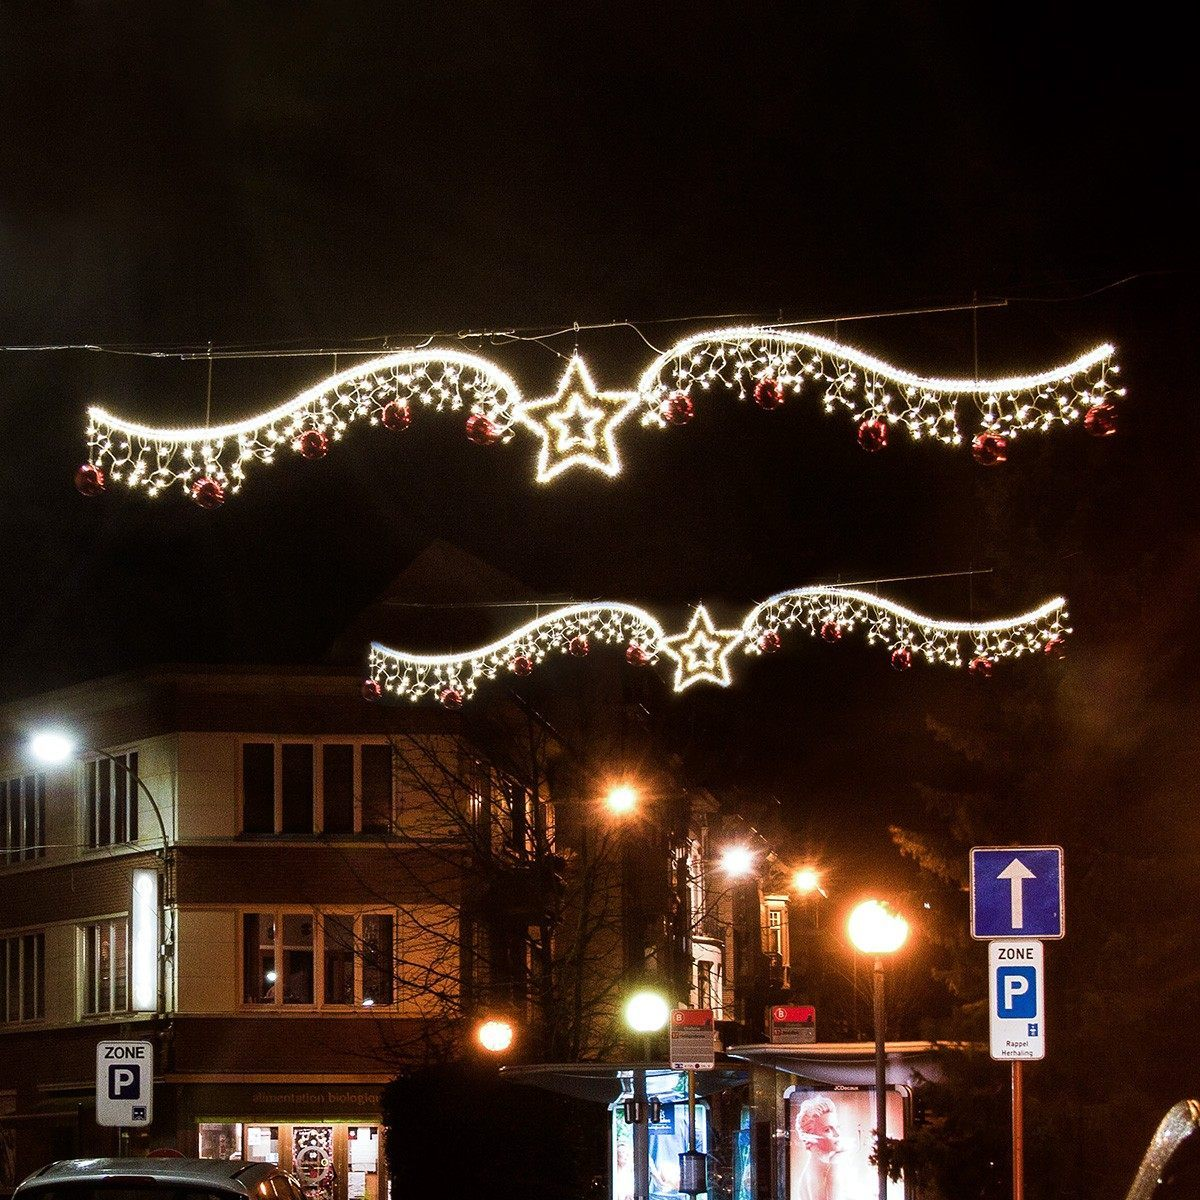 2 Illuminated `Portobello` Warm White Cross Street Motif, 2.8m